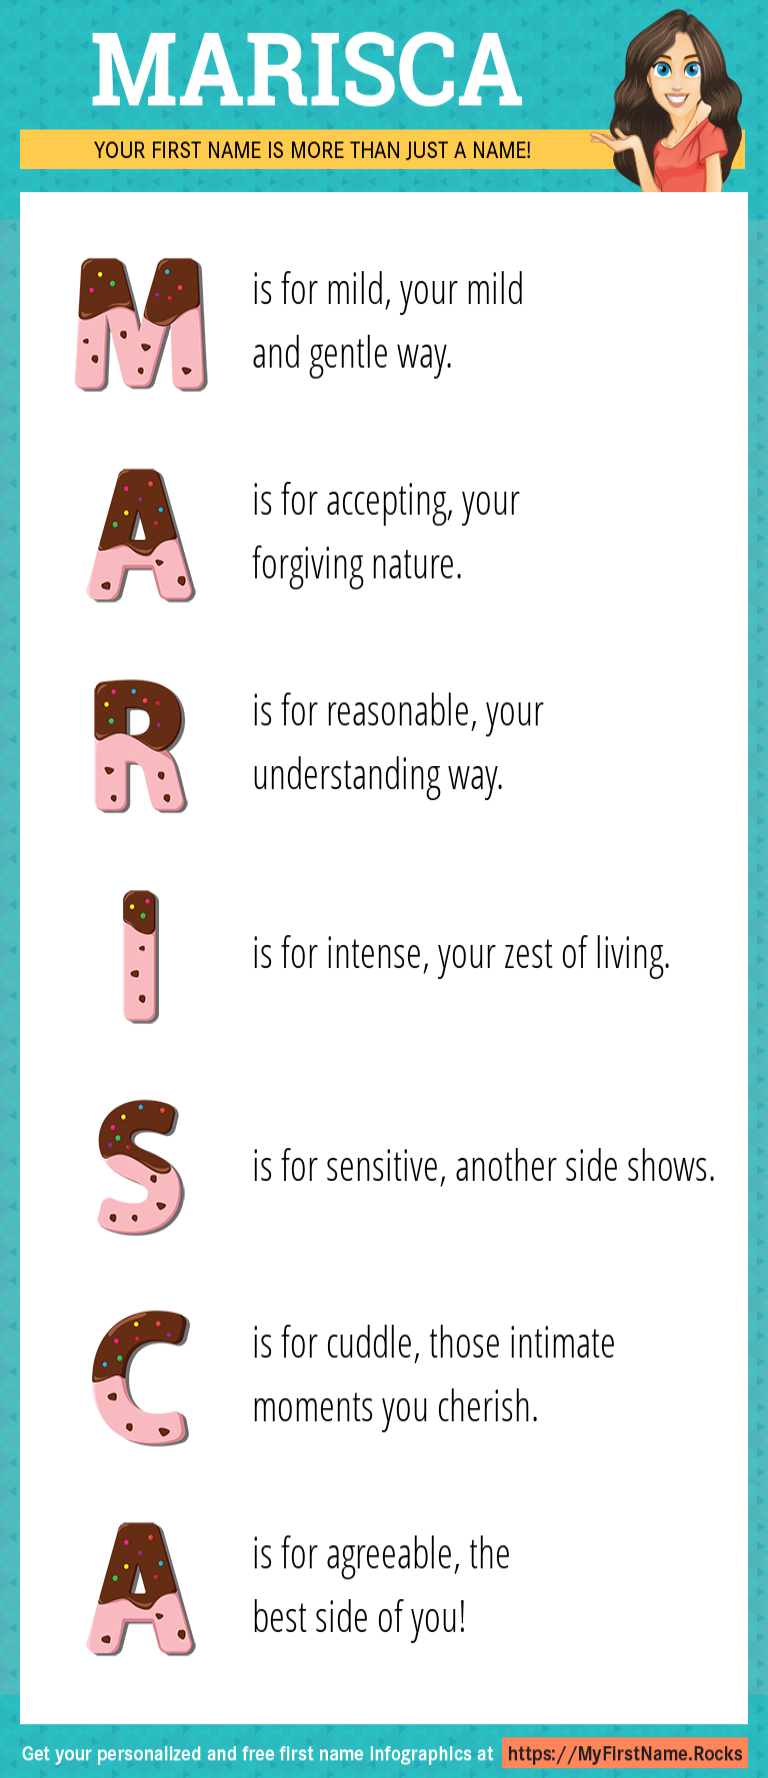 Marisca Infographics